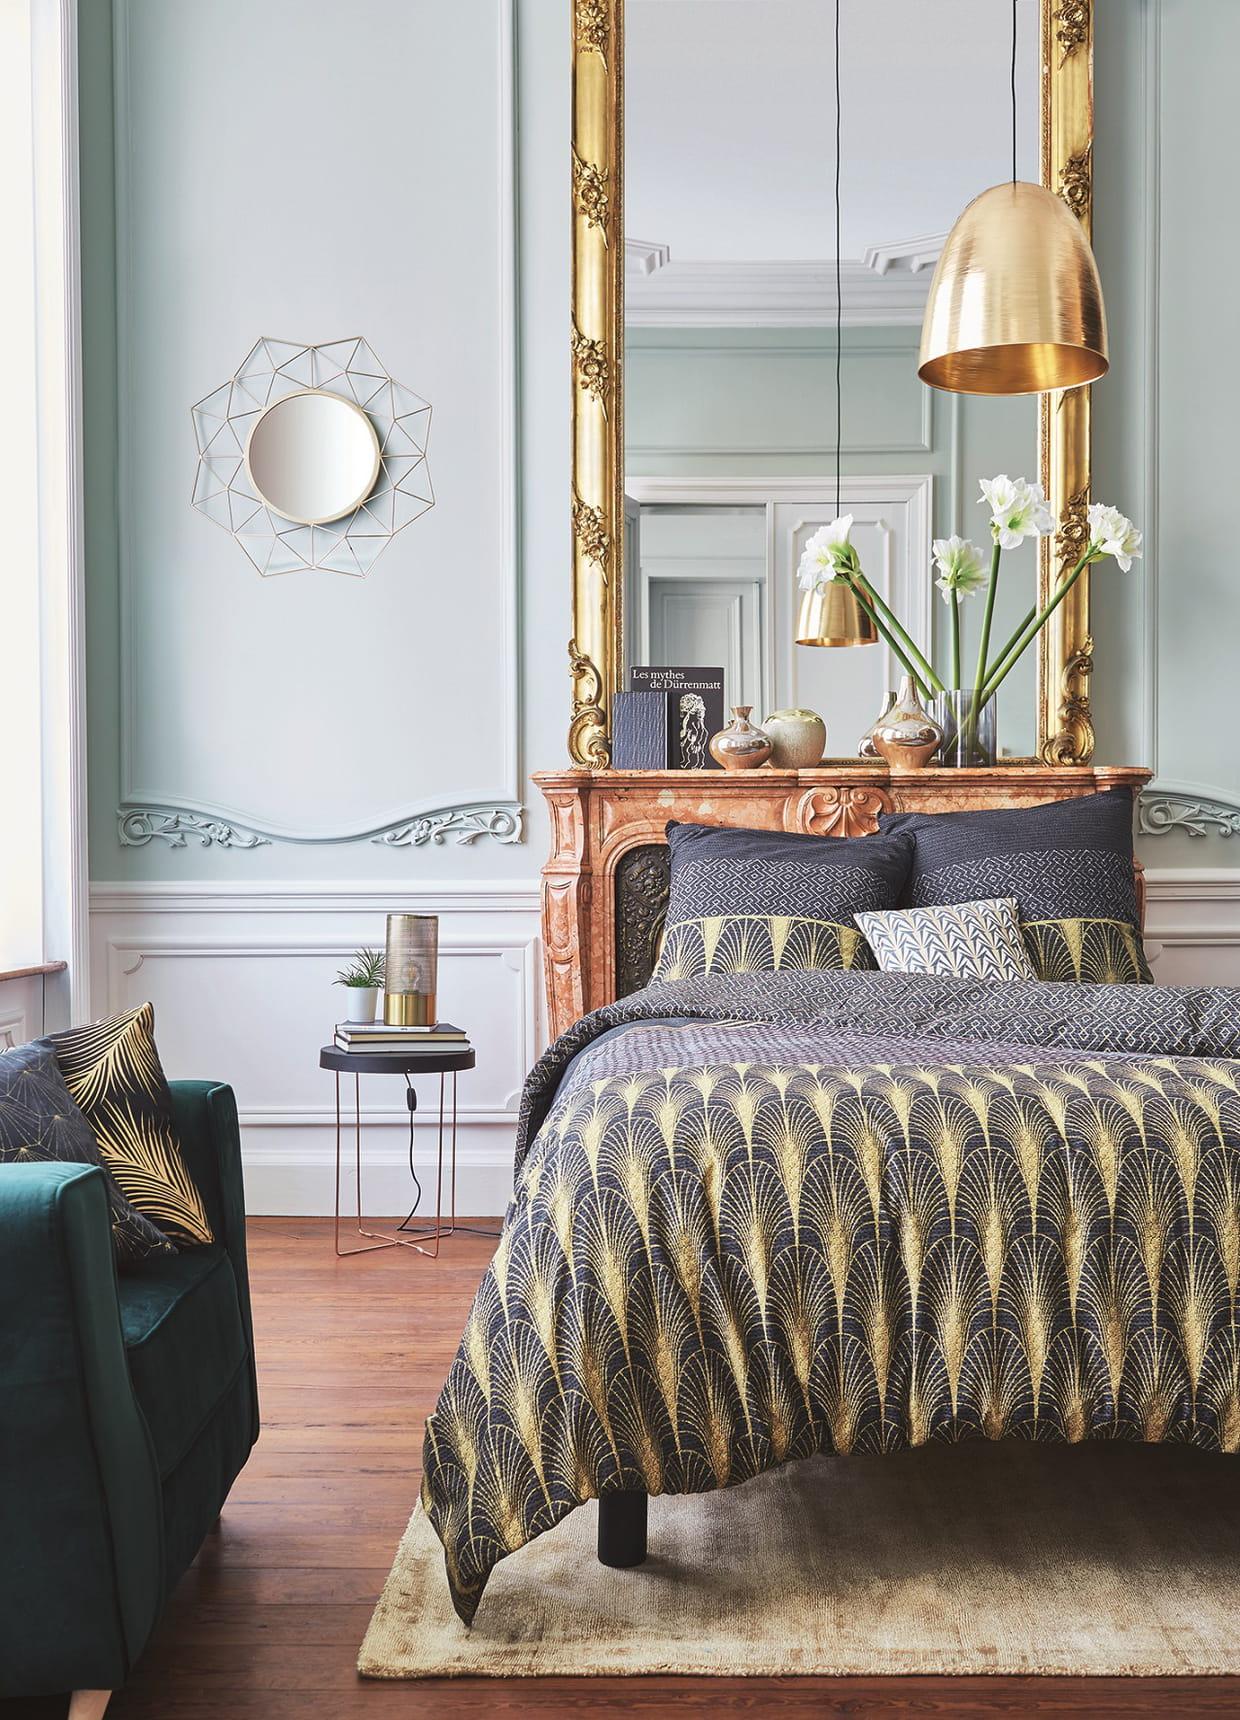 housse de lit charleston d 39 alin a. Black Bedroom Furniture Sets. Home Design Ideas